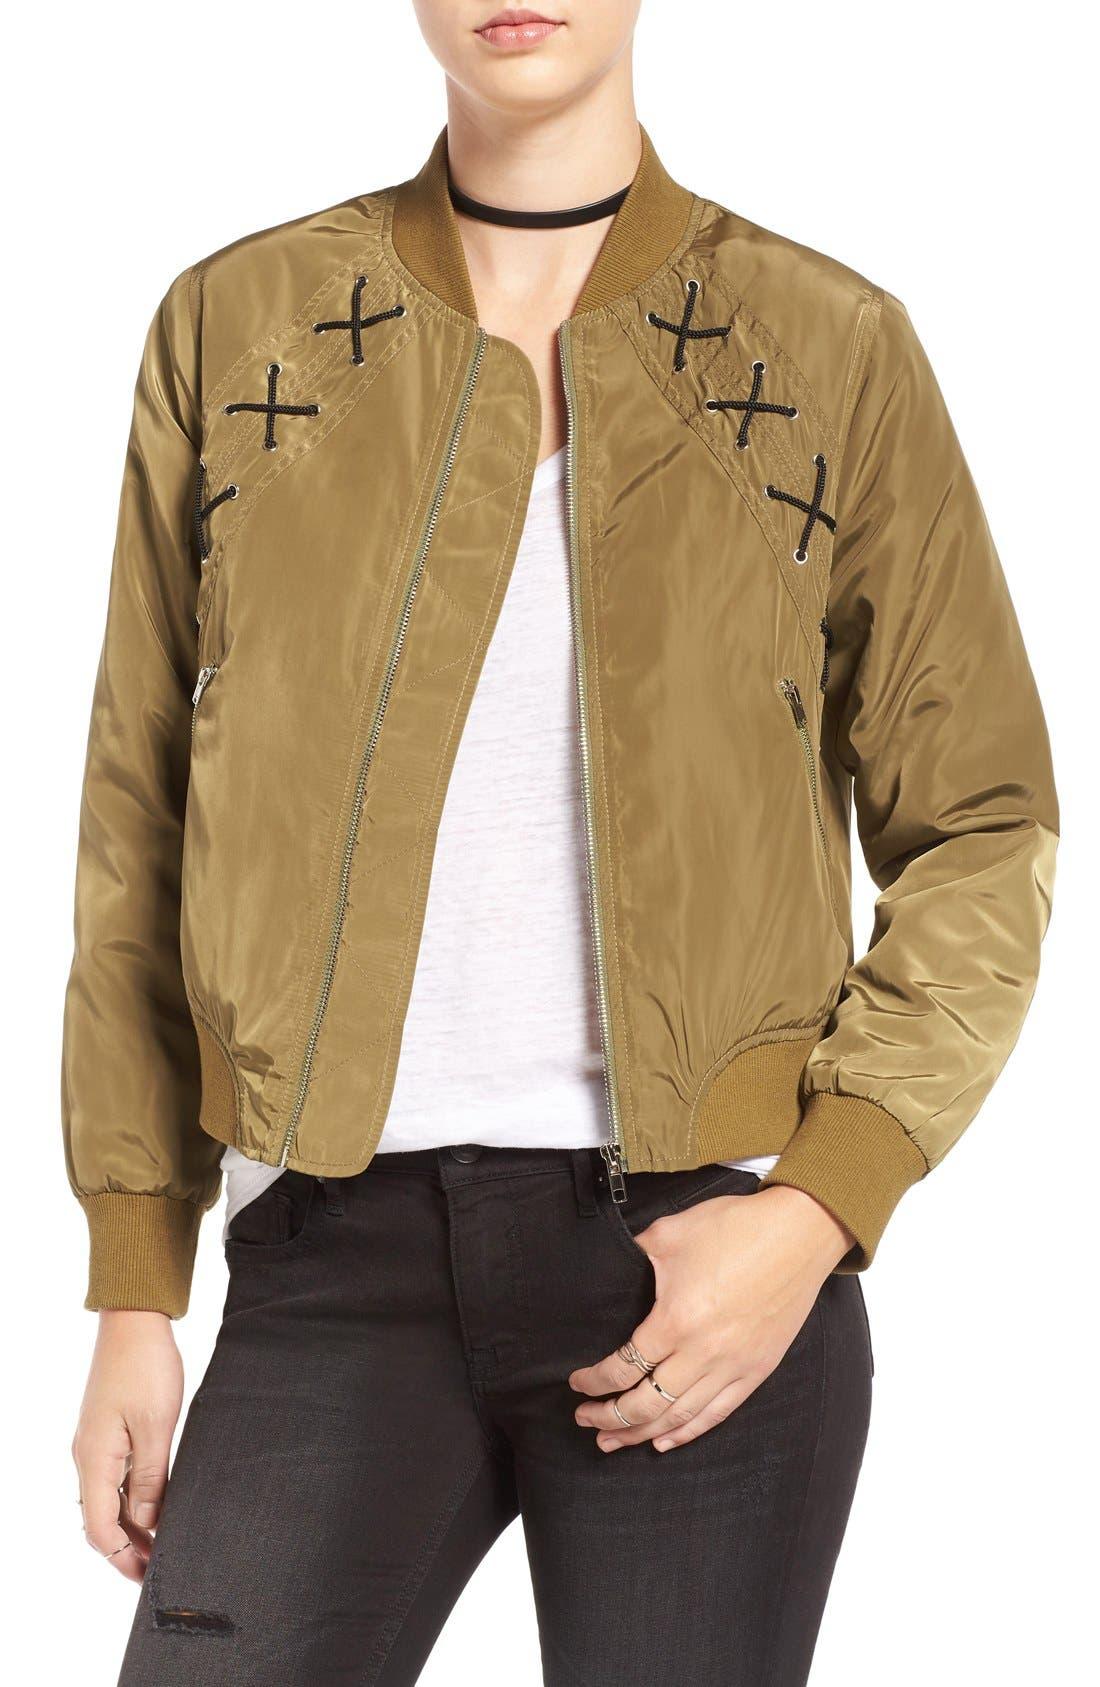 Main Image - Elodie Cross Stitch Bomber Jacket